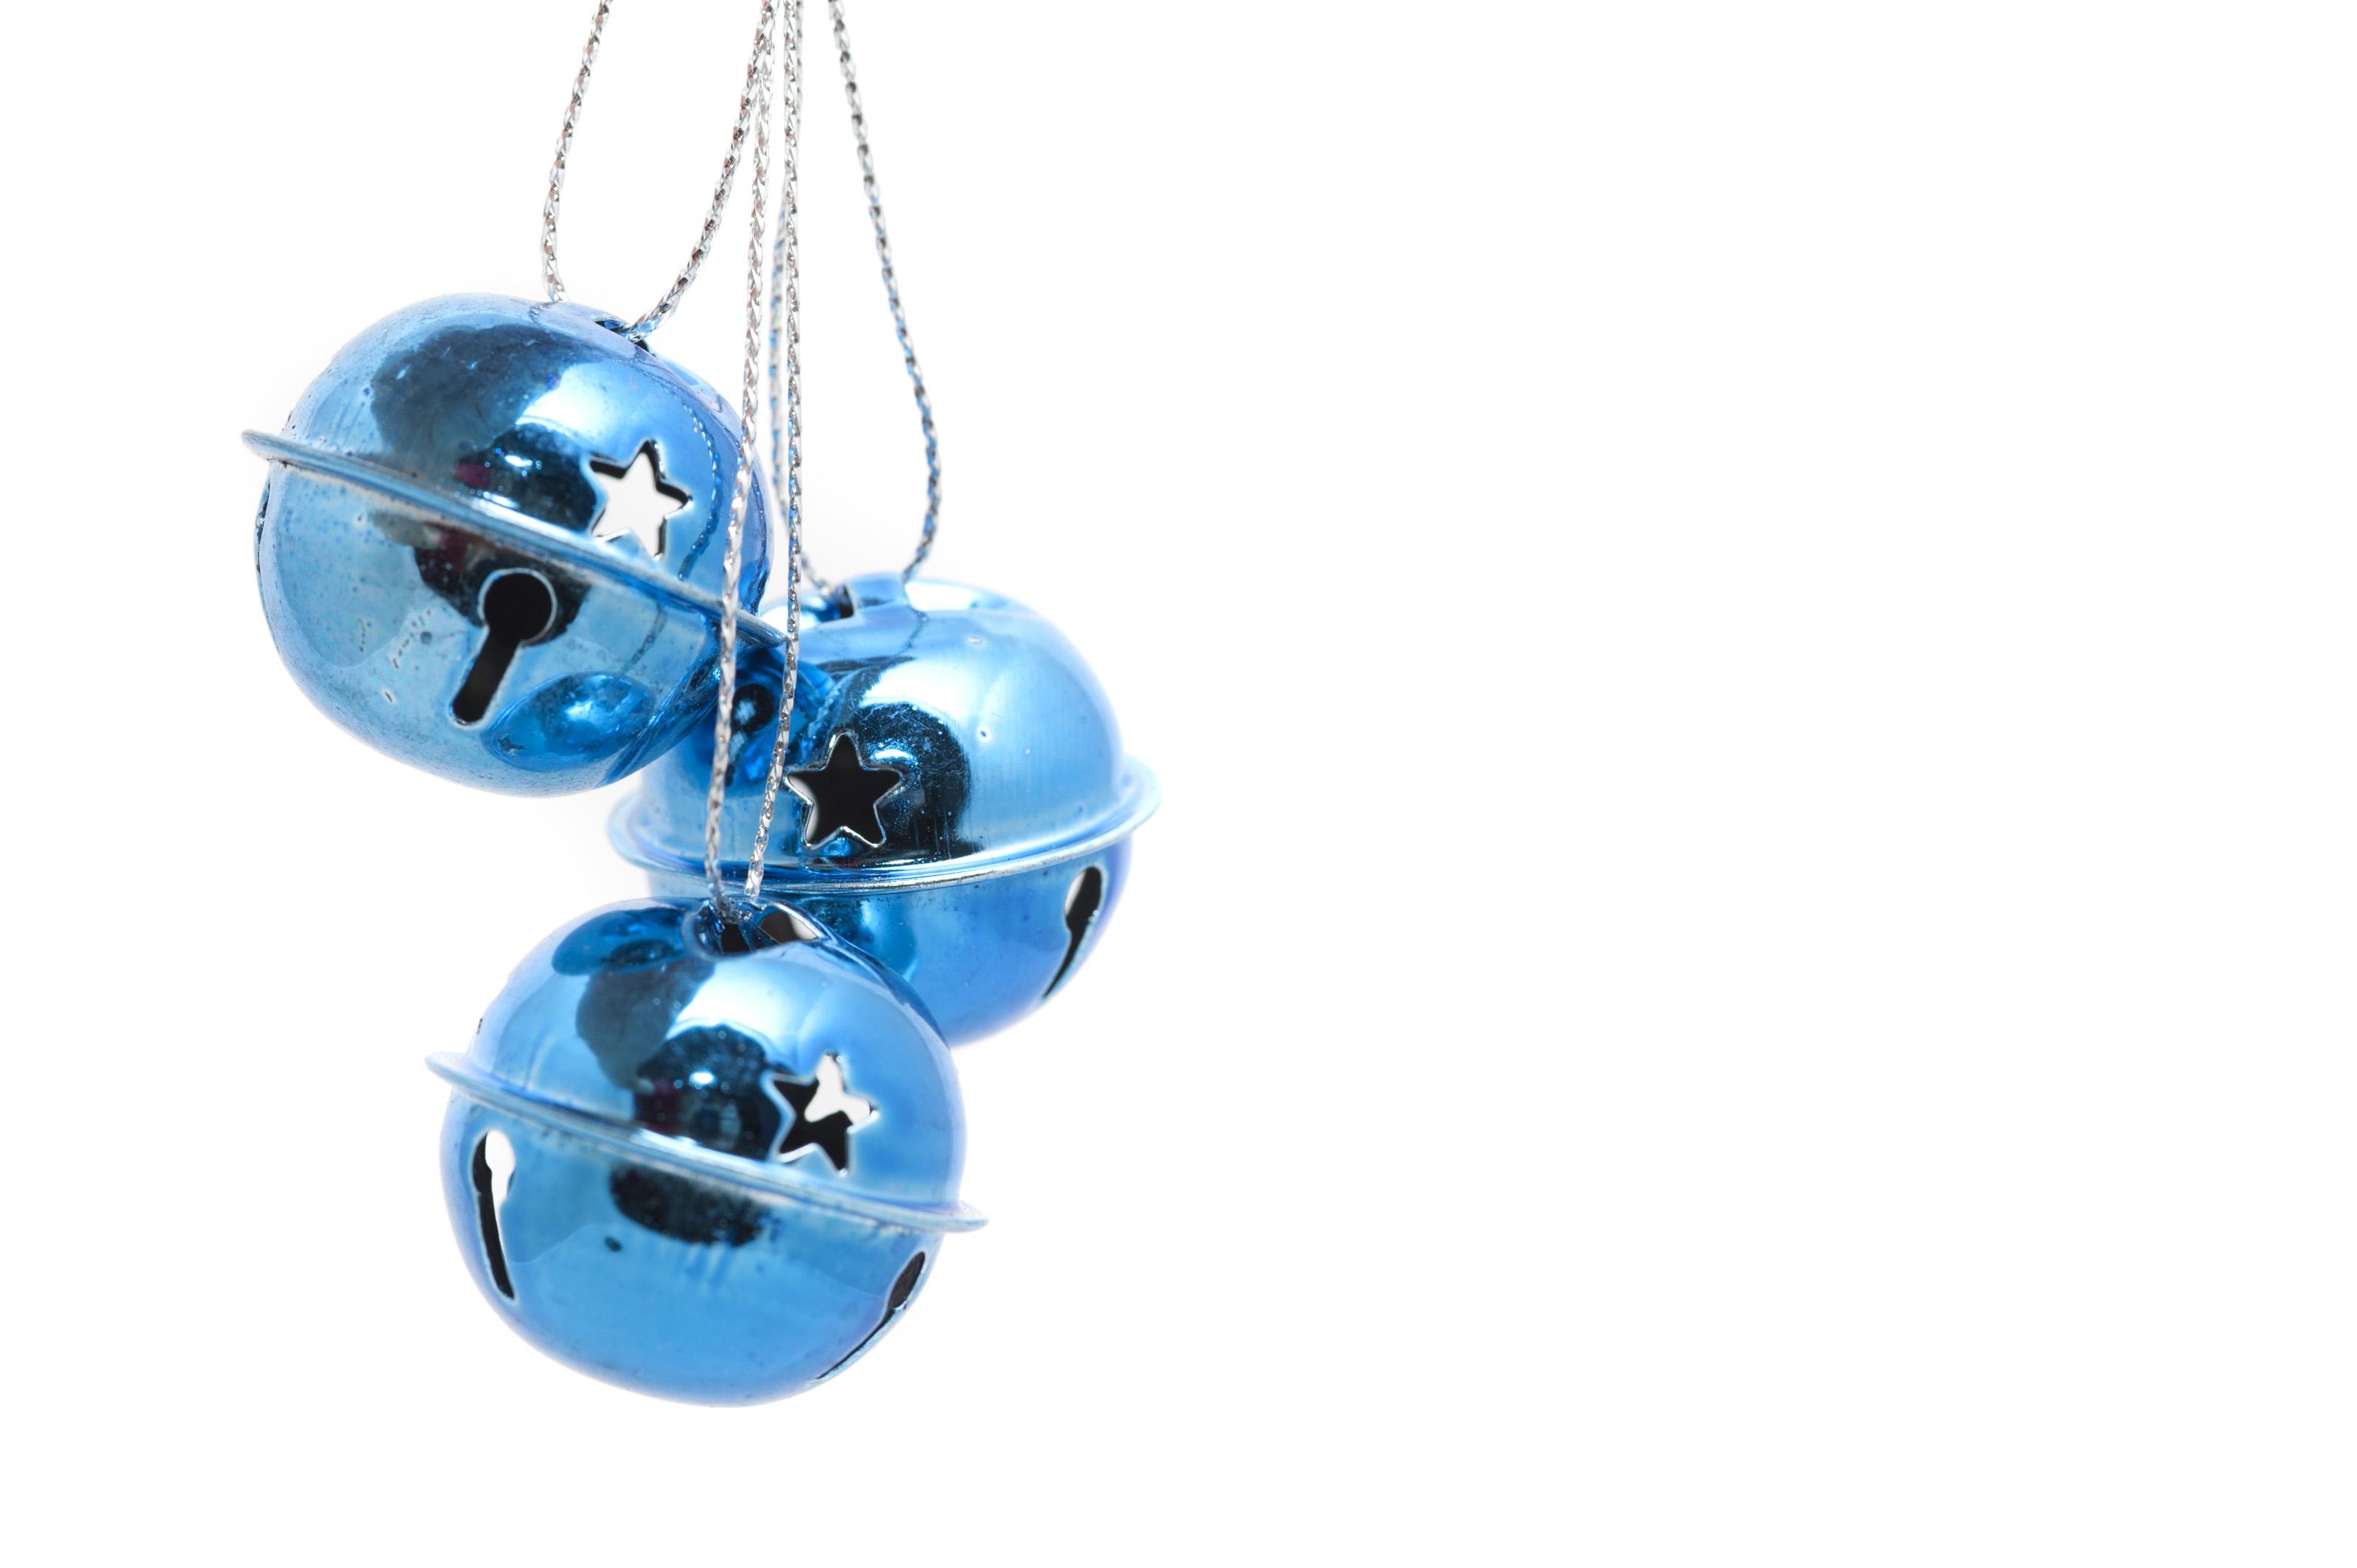 Free stock photo pretty blue jingle bells